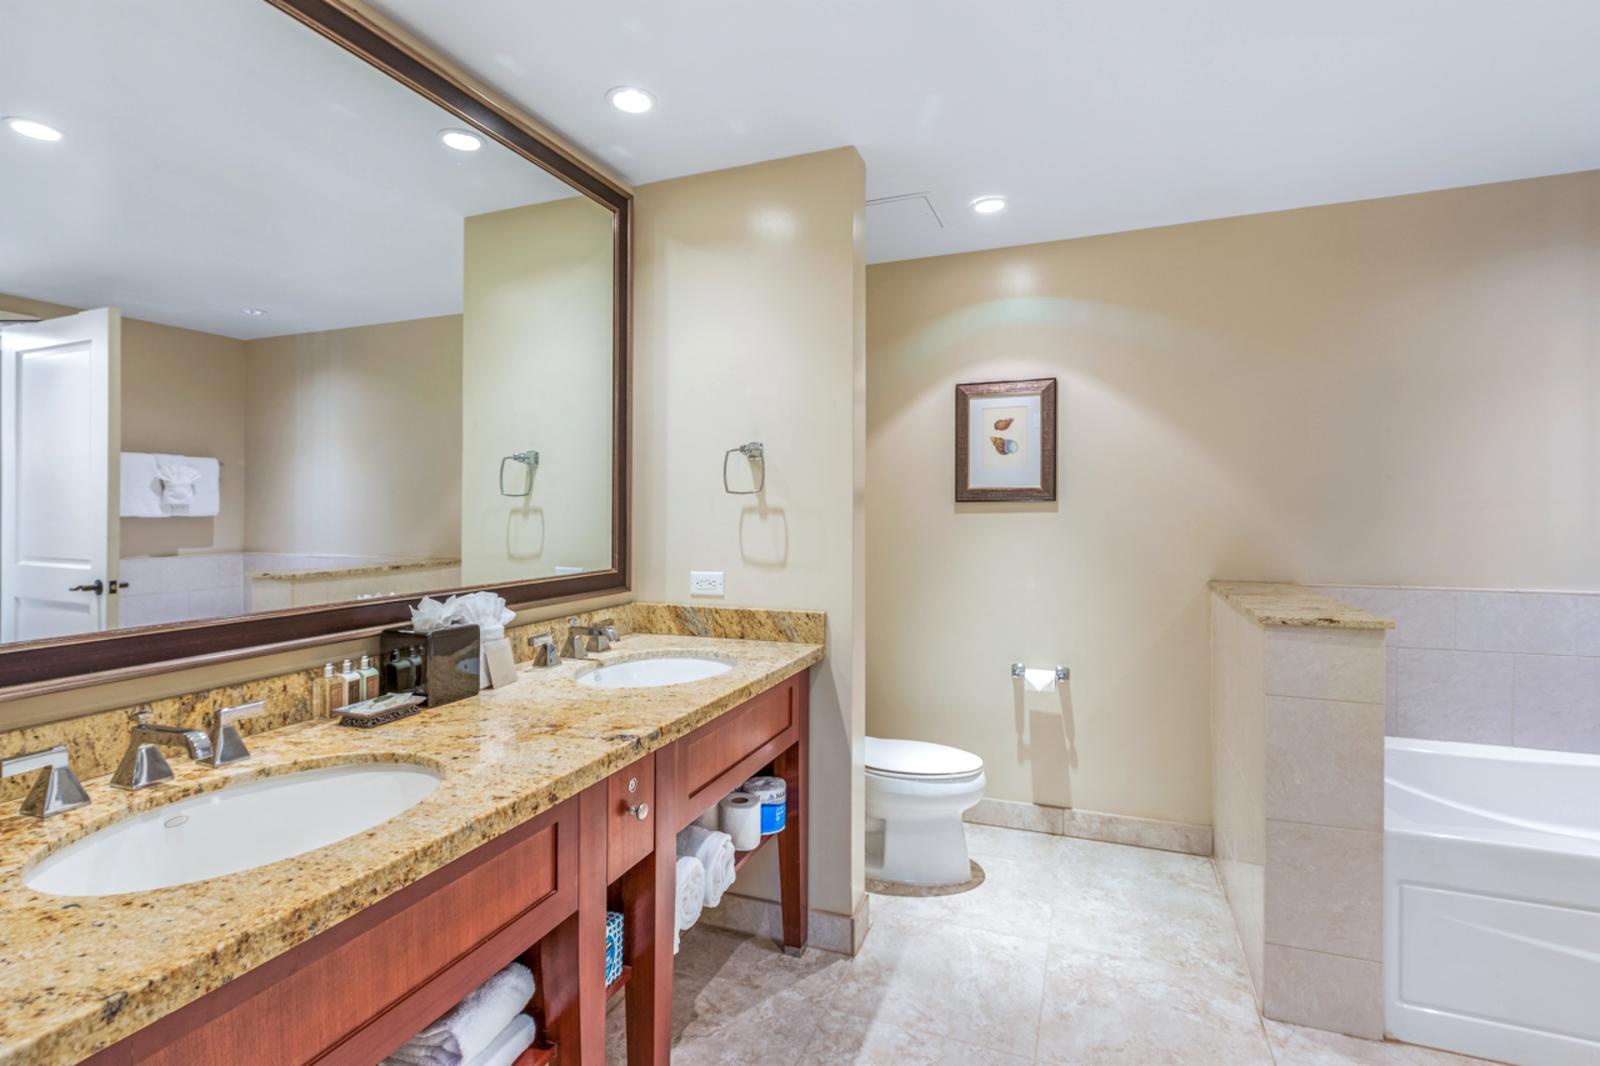 Custom dual sinks complete with luxury amenities